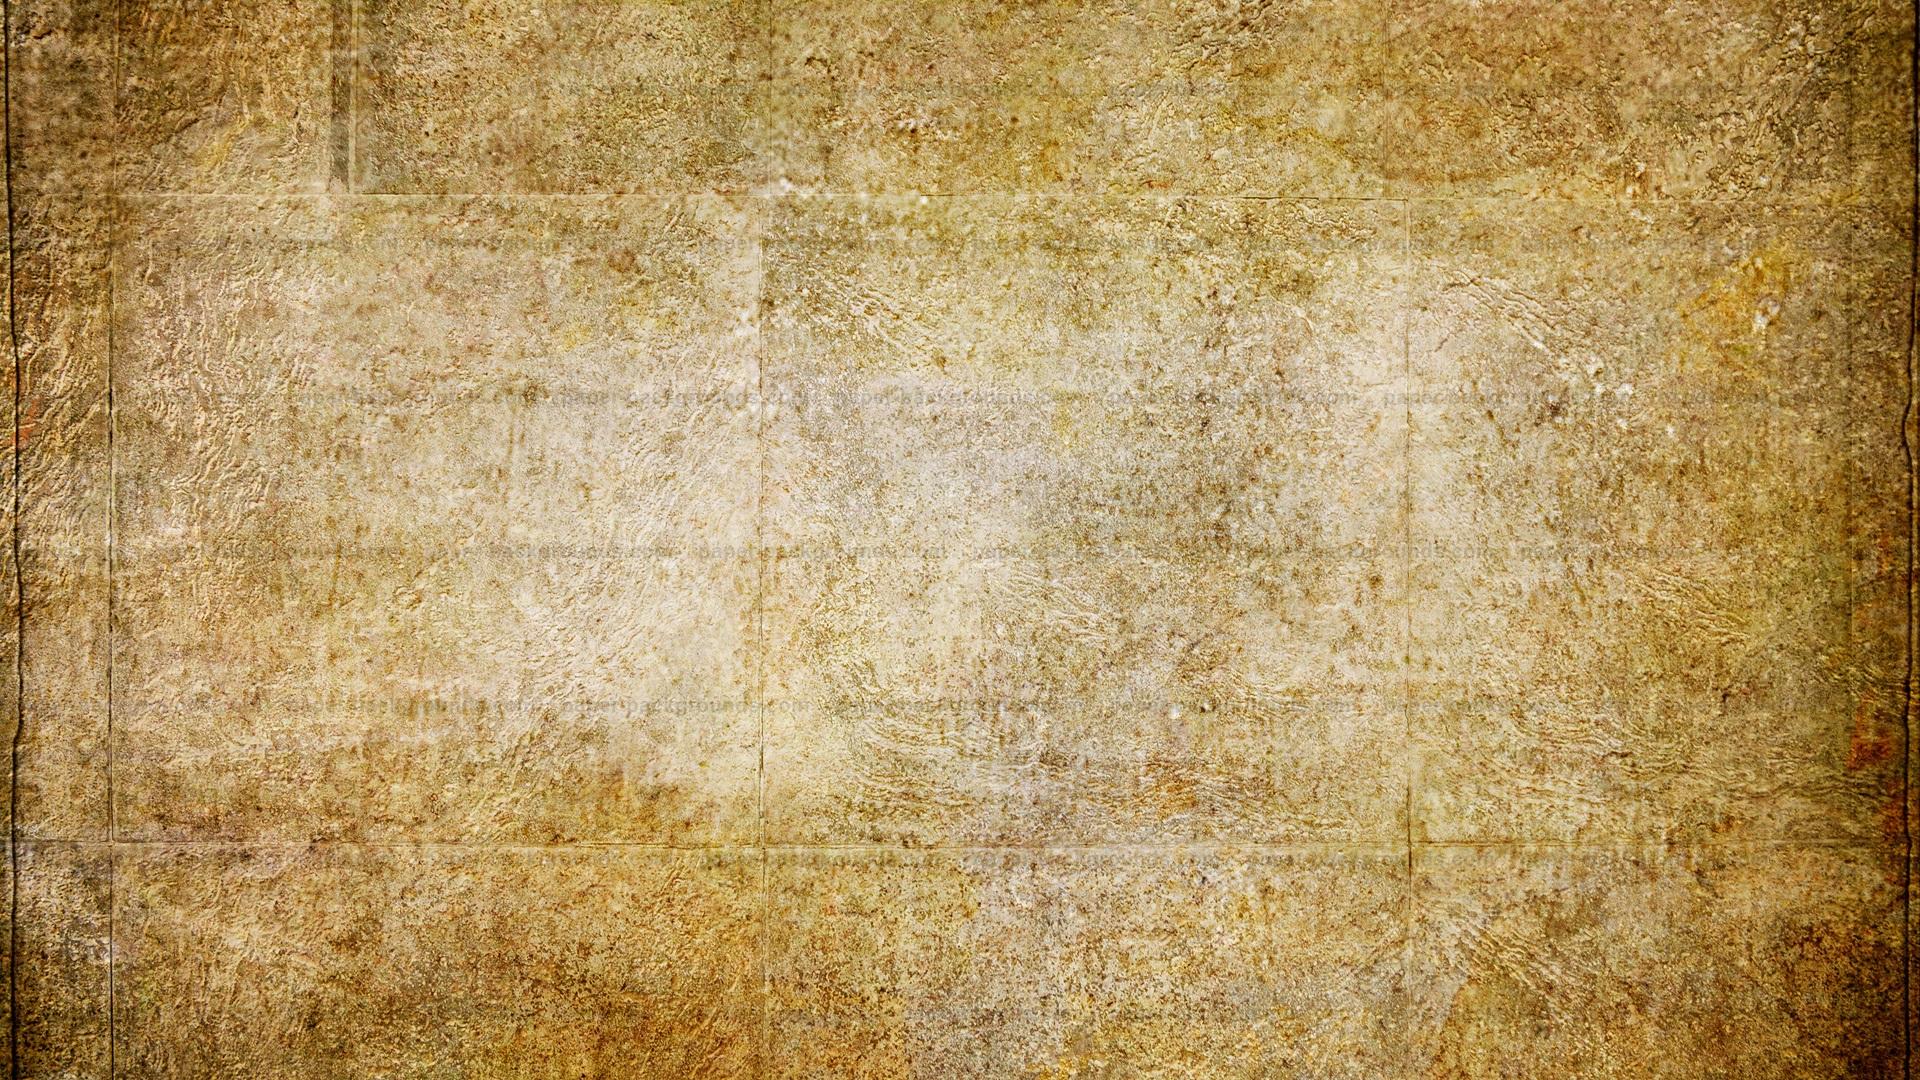 Hd texture backgrounds wallpapersafari - White grunge background 1920x1080 ...